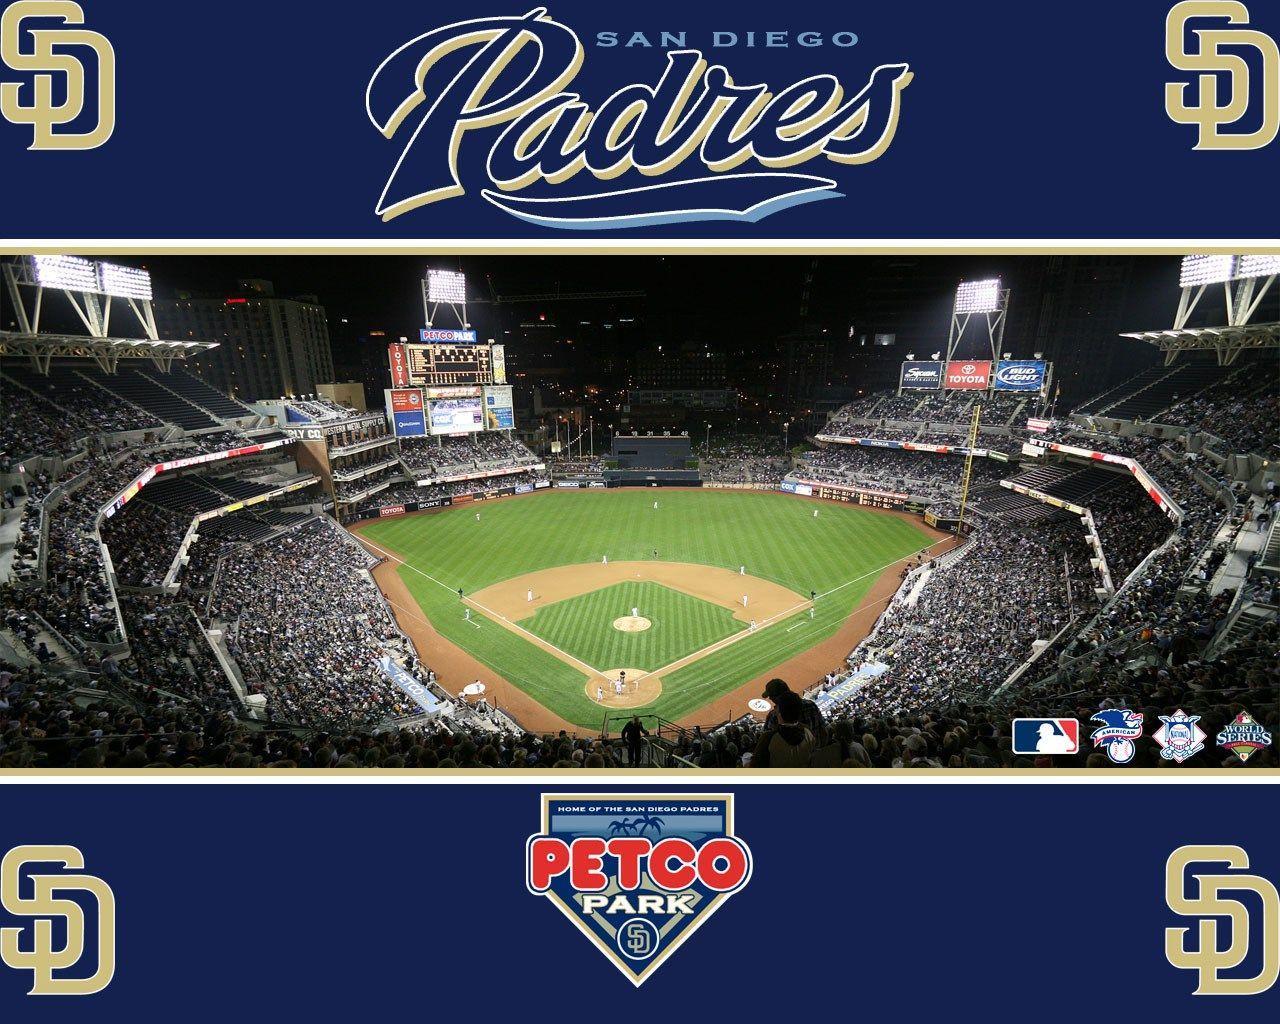 San Diego Padres Wallpapers Hd San Diego Padres San Diego Petco Park